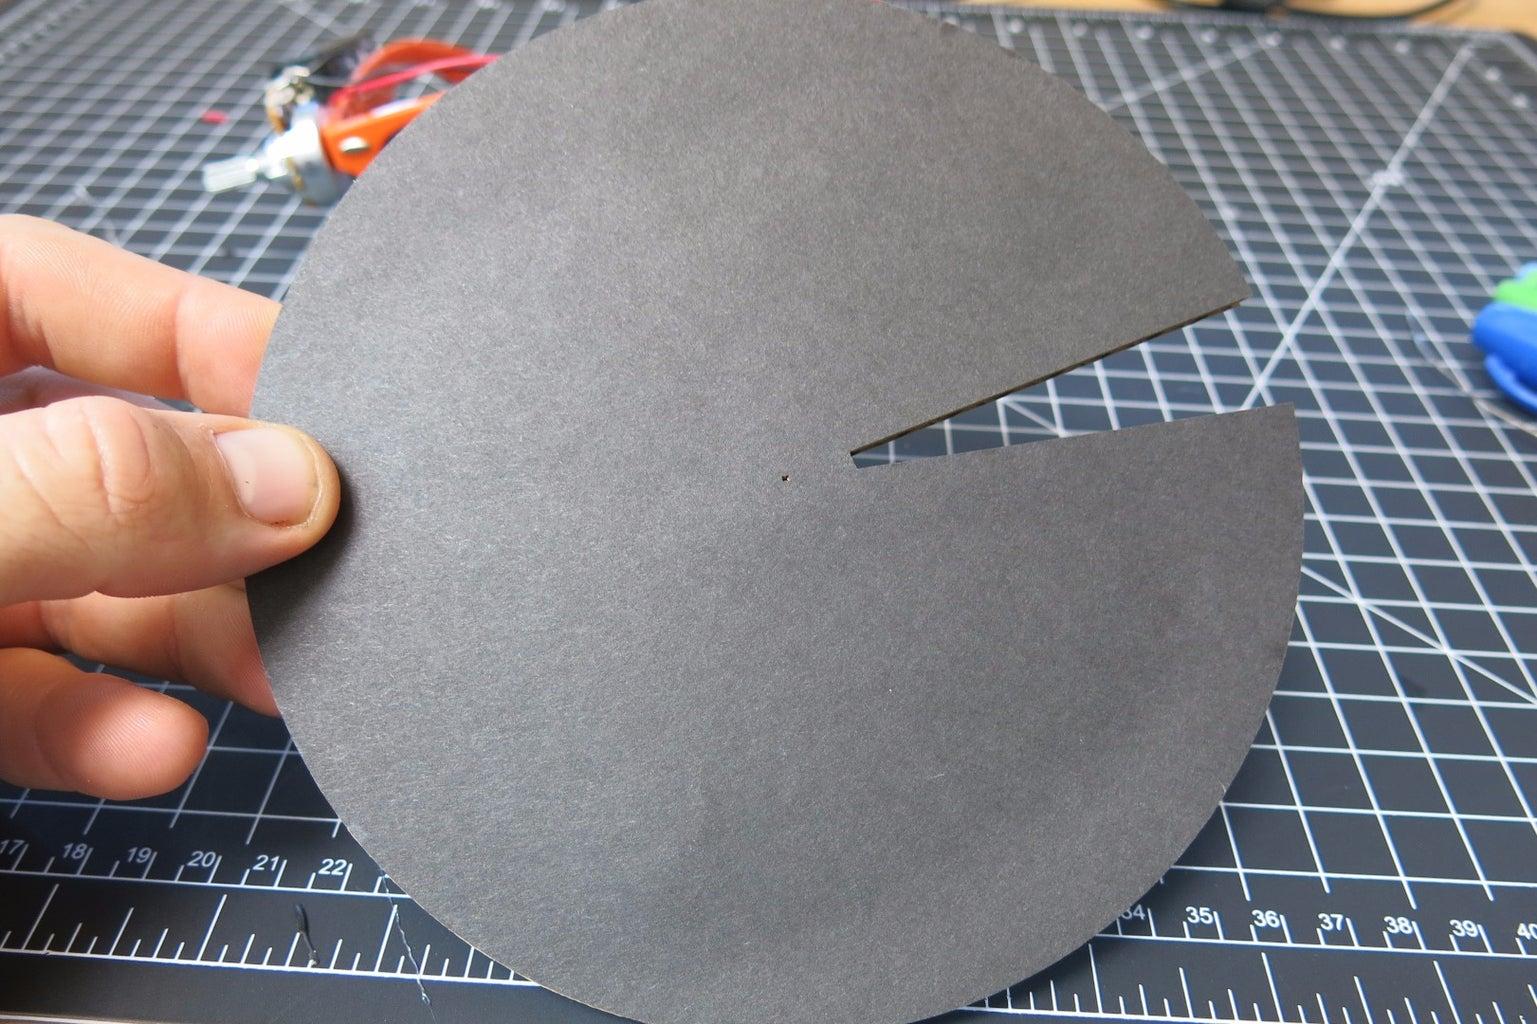 The Strobe Disc